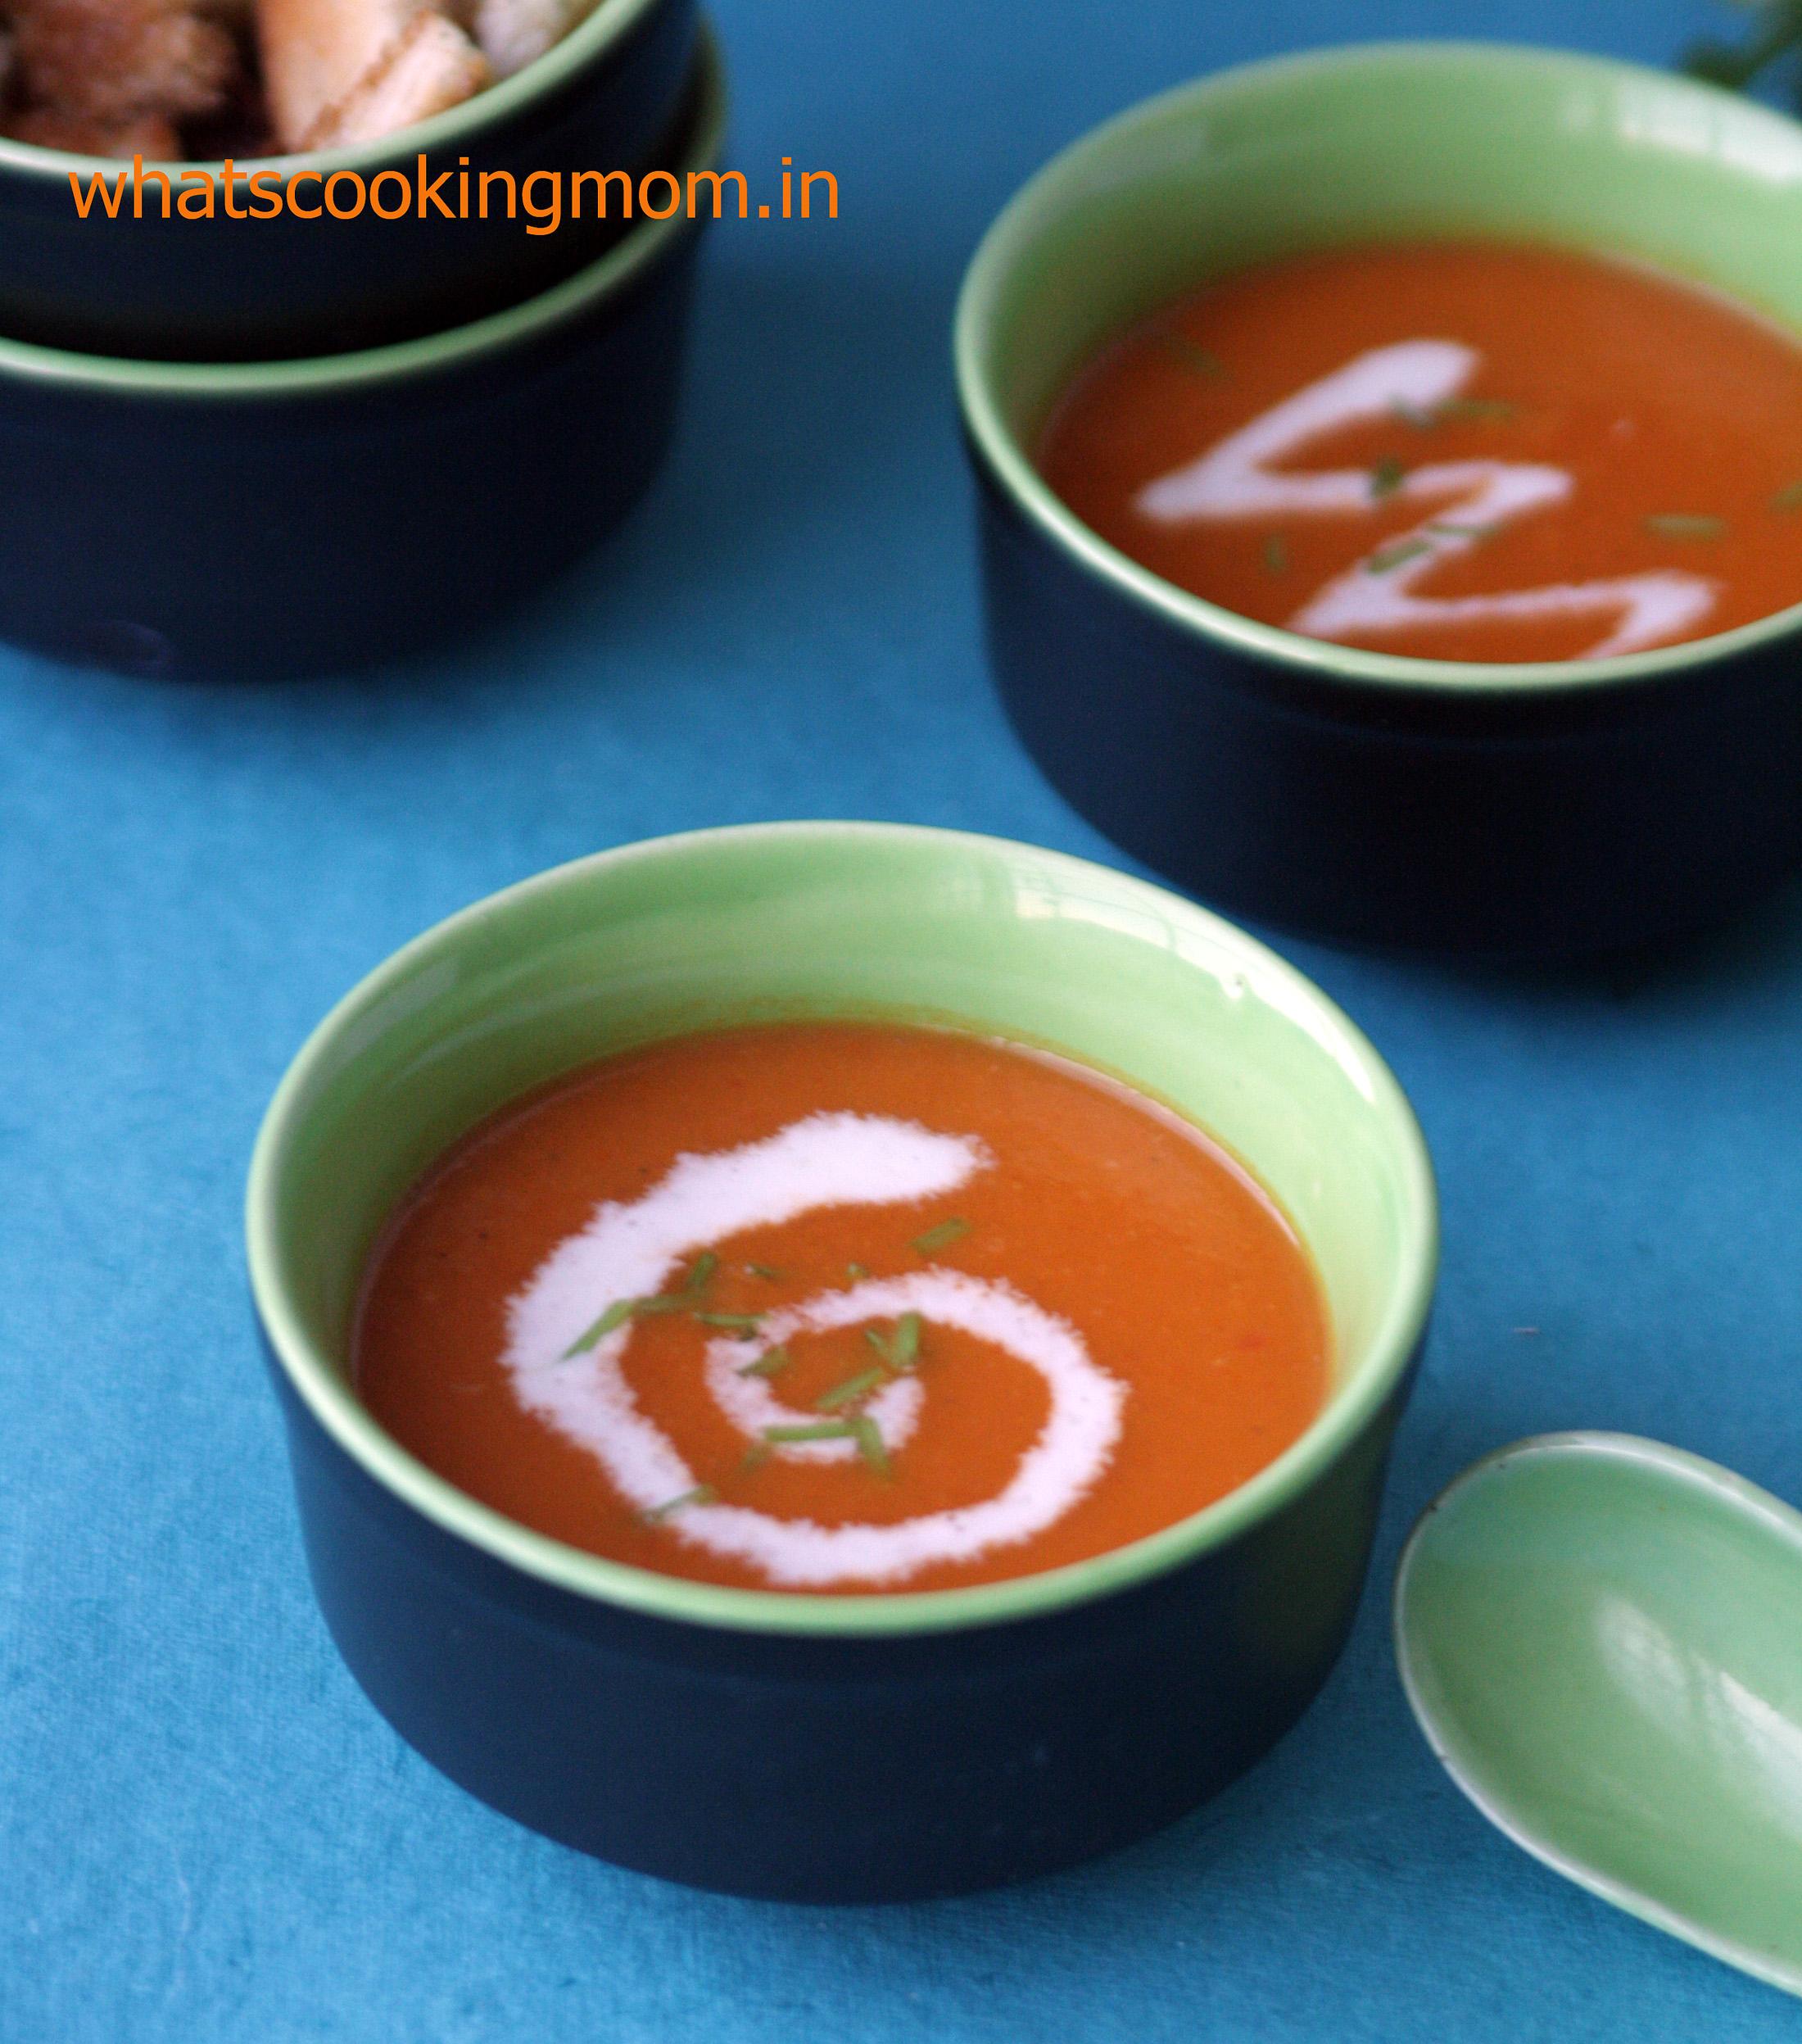 Roasted tomato soup 6